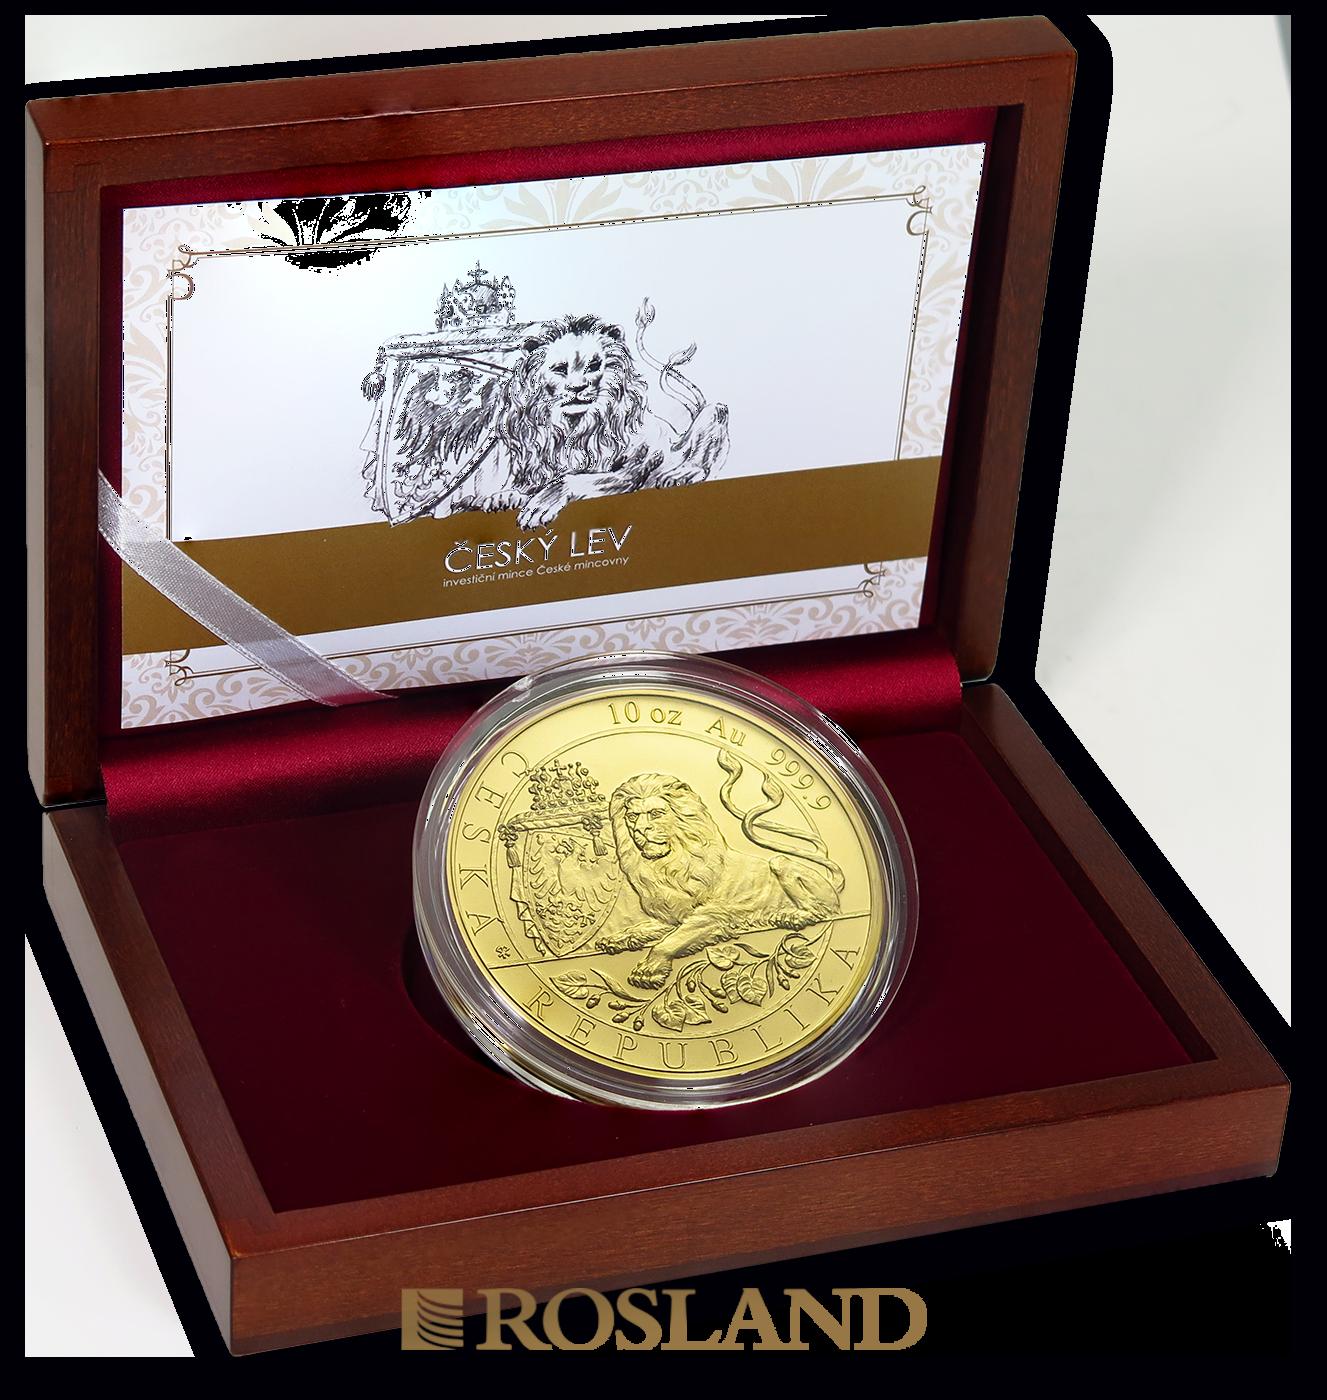 10 Unzen Goldmünze Tschechischer Löwe 2019 (Box, Zertifikat)